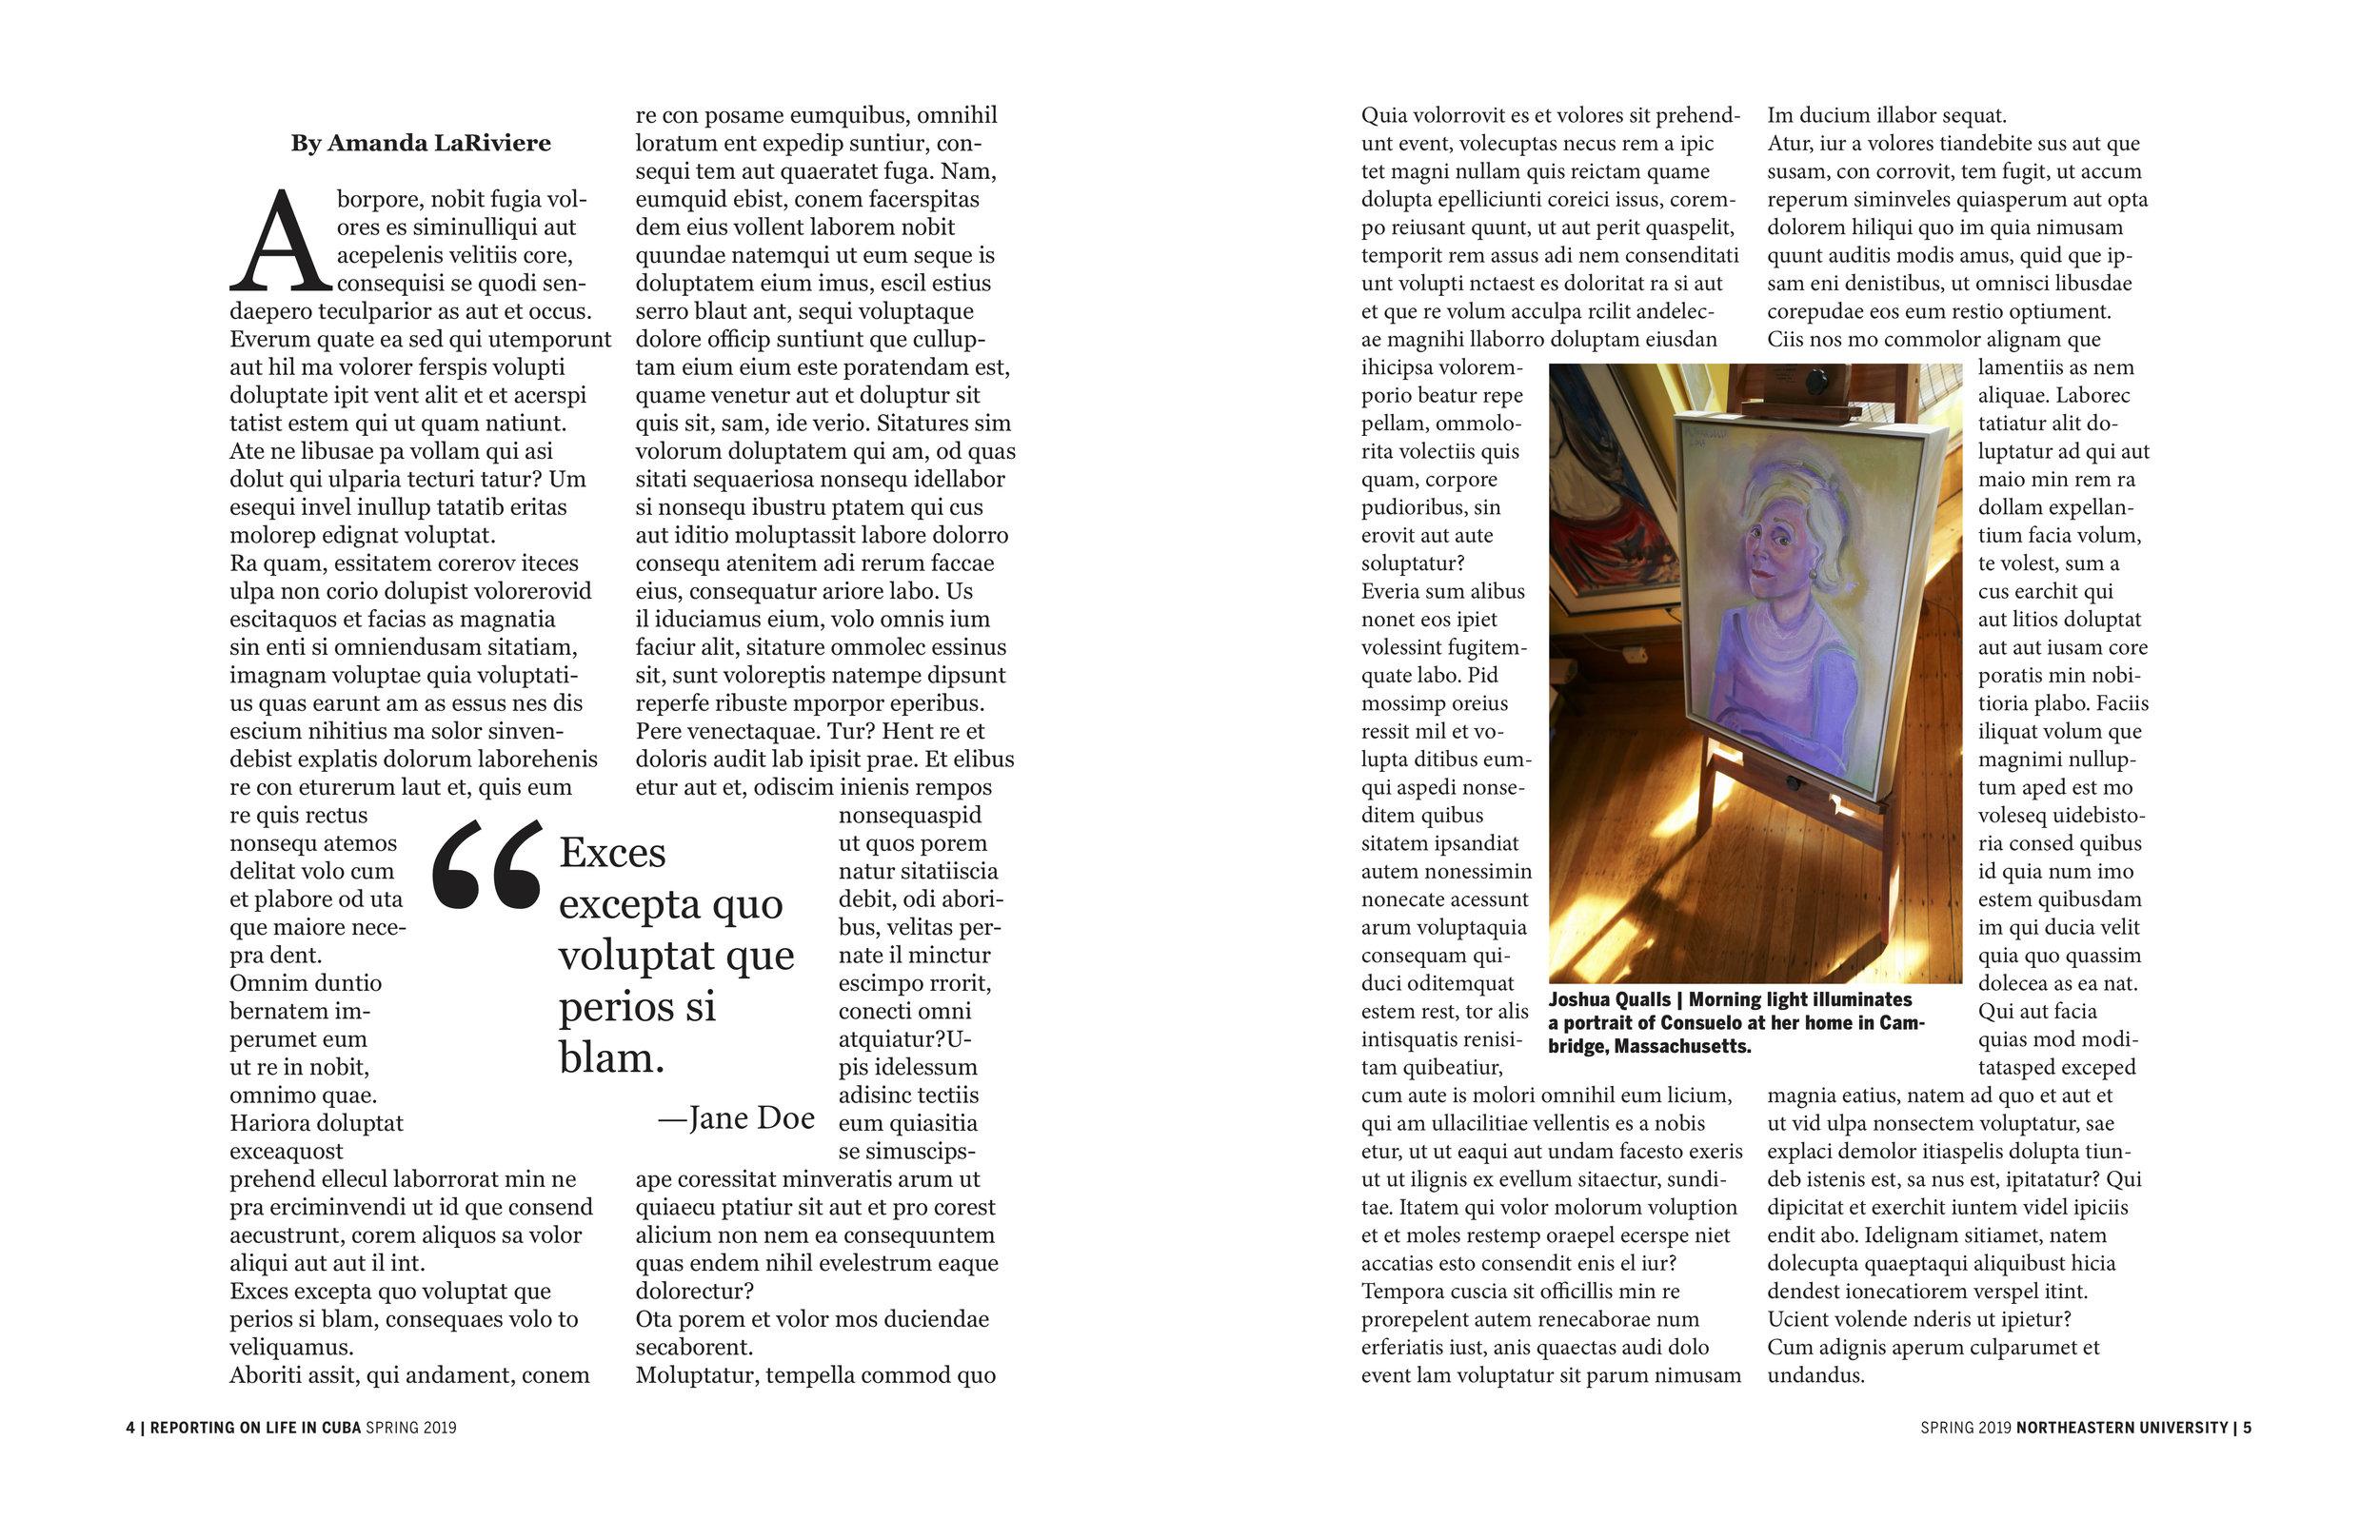 cuba magazine template 2.jpg